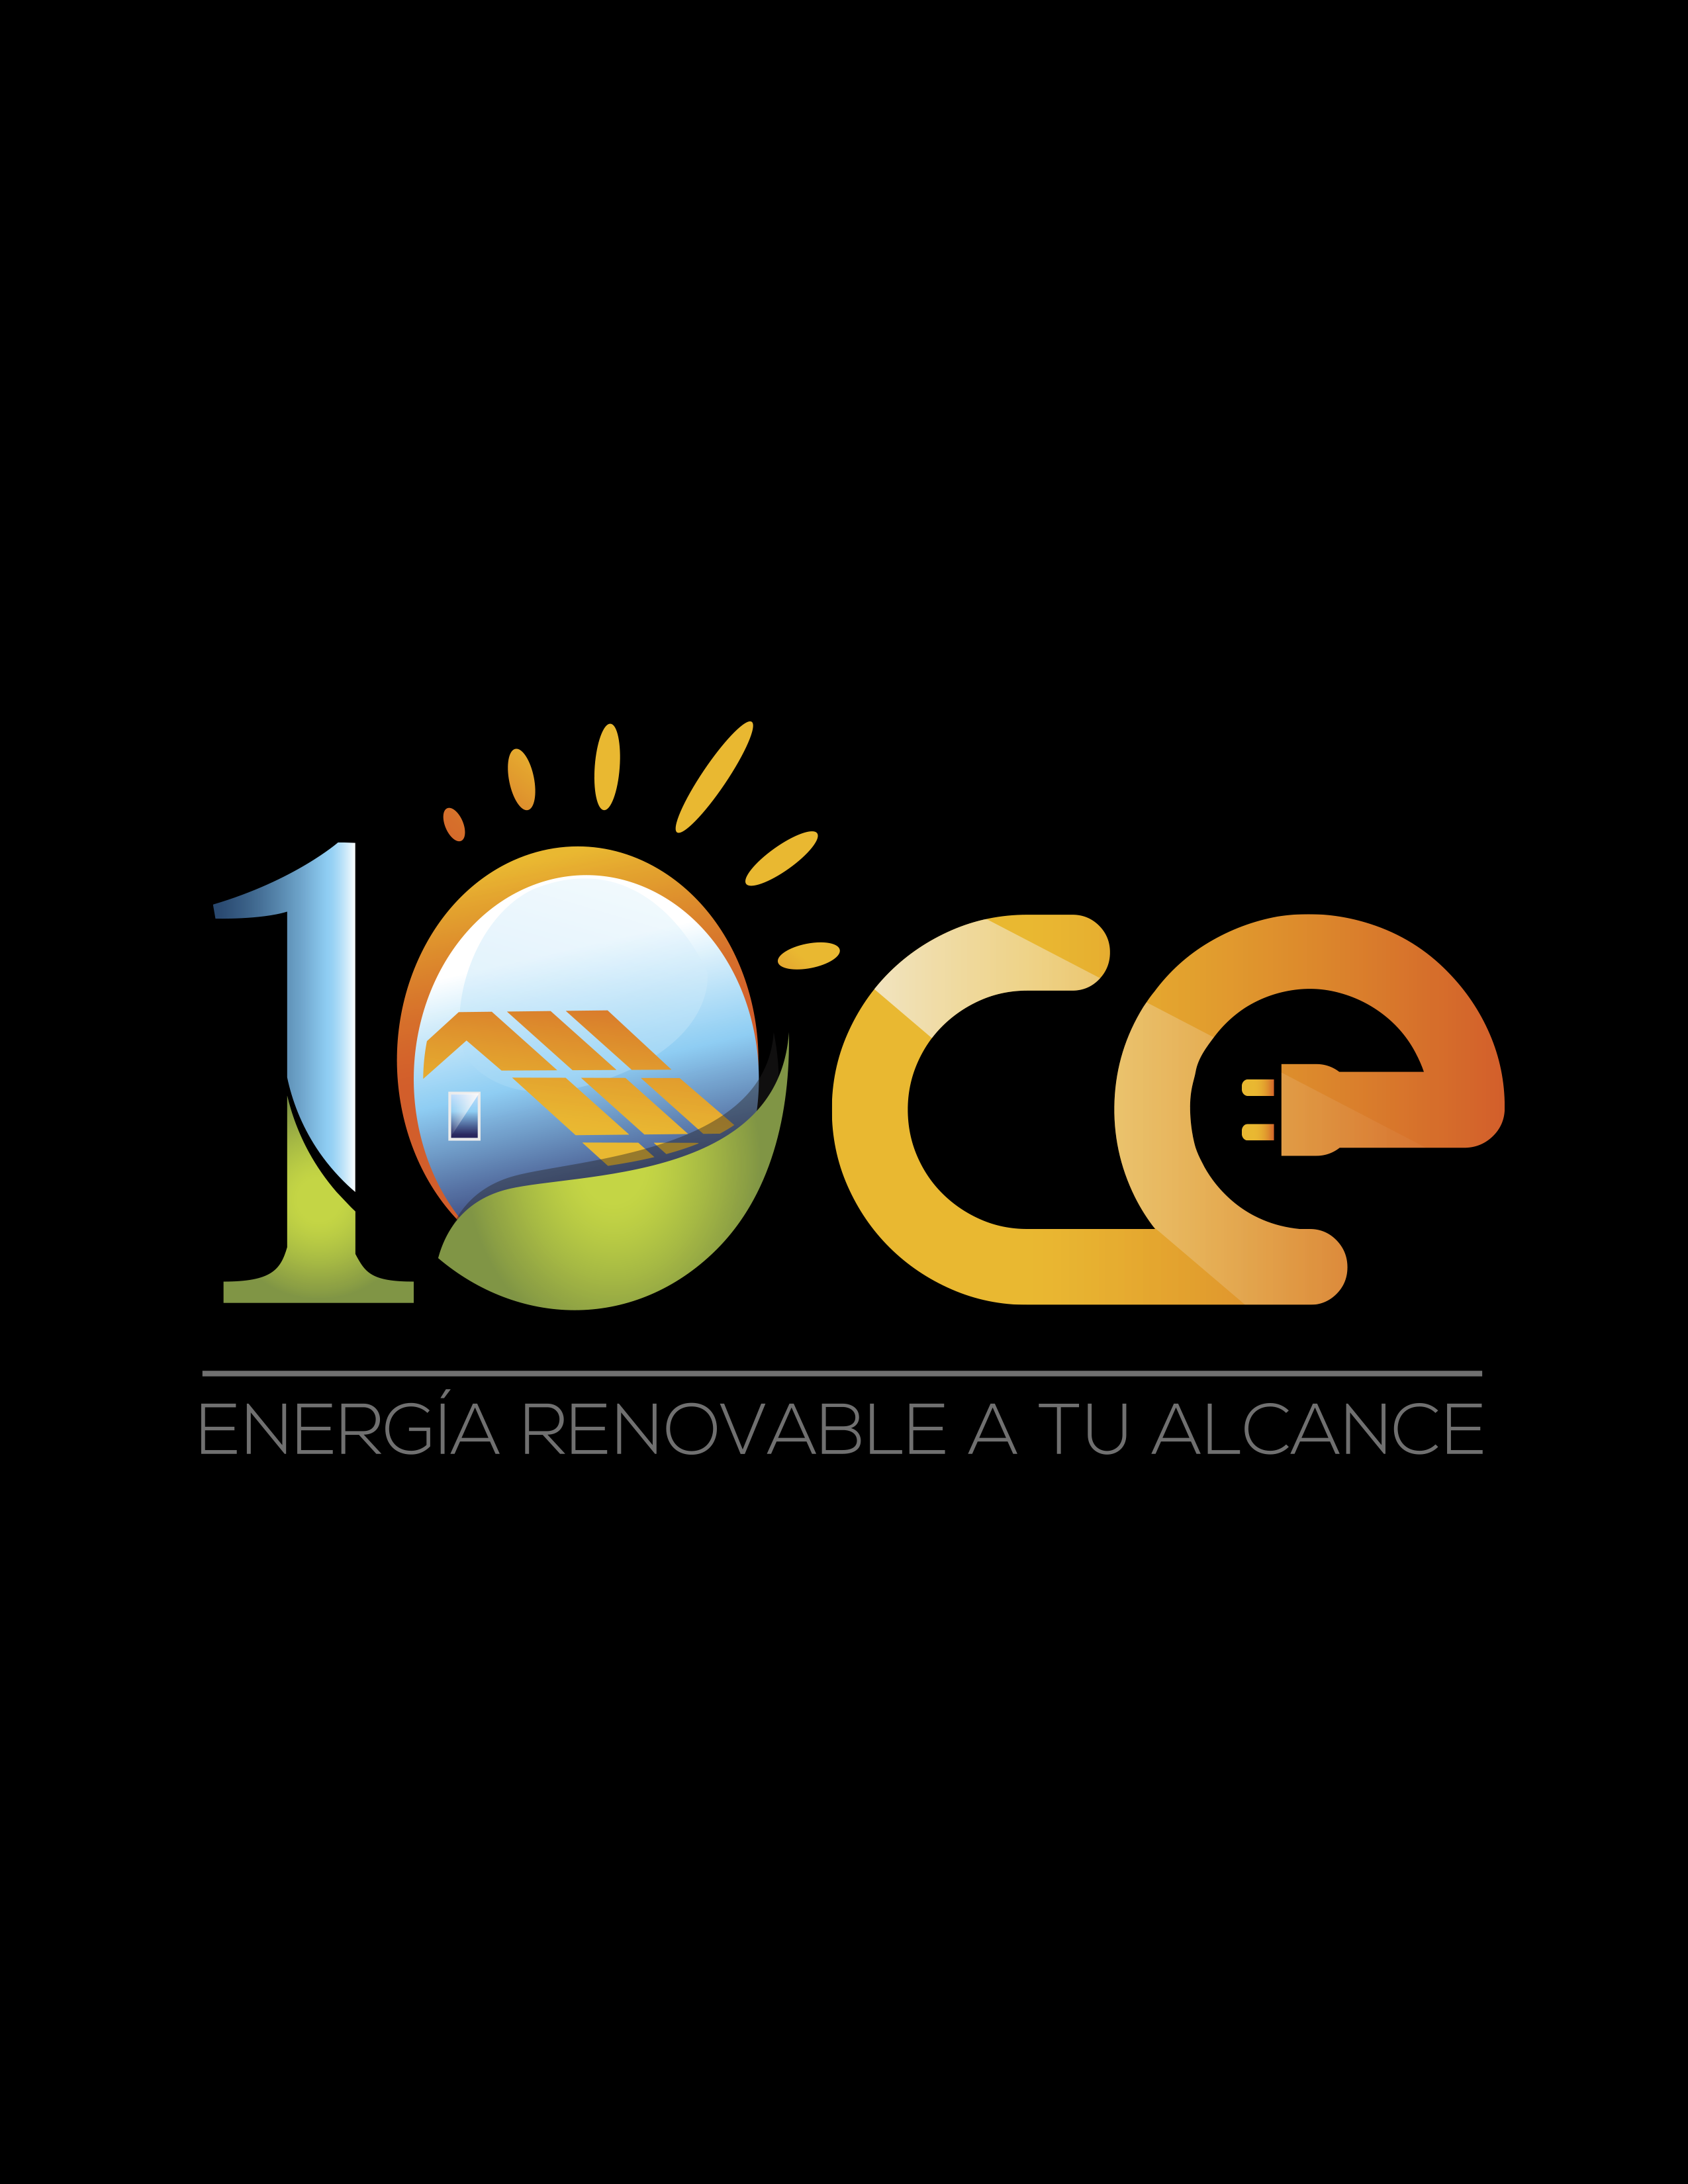 10Ce Energías Renovables